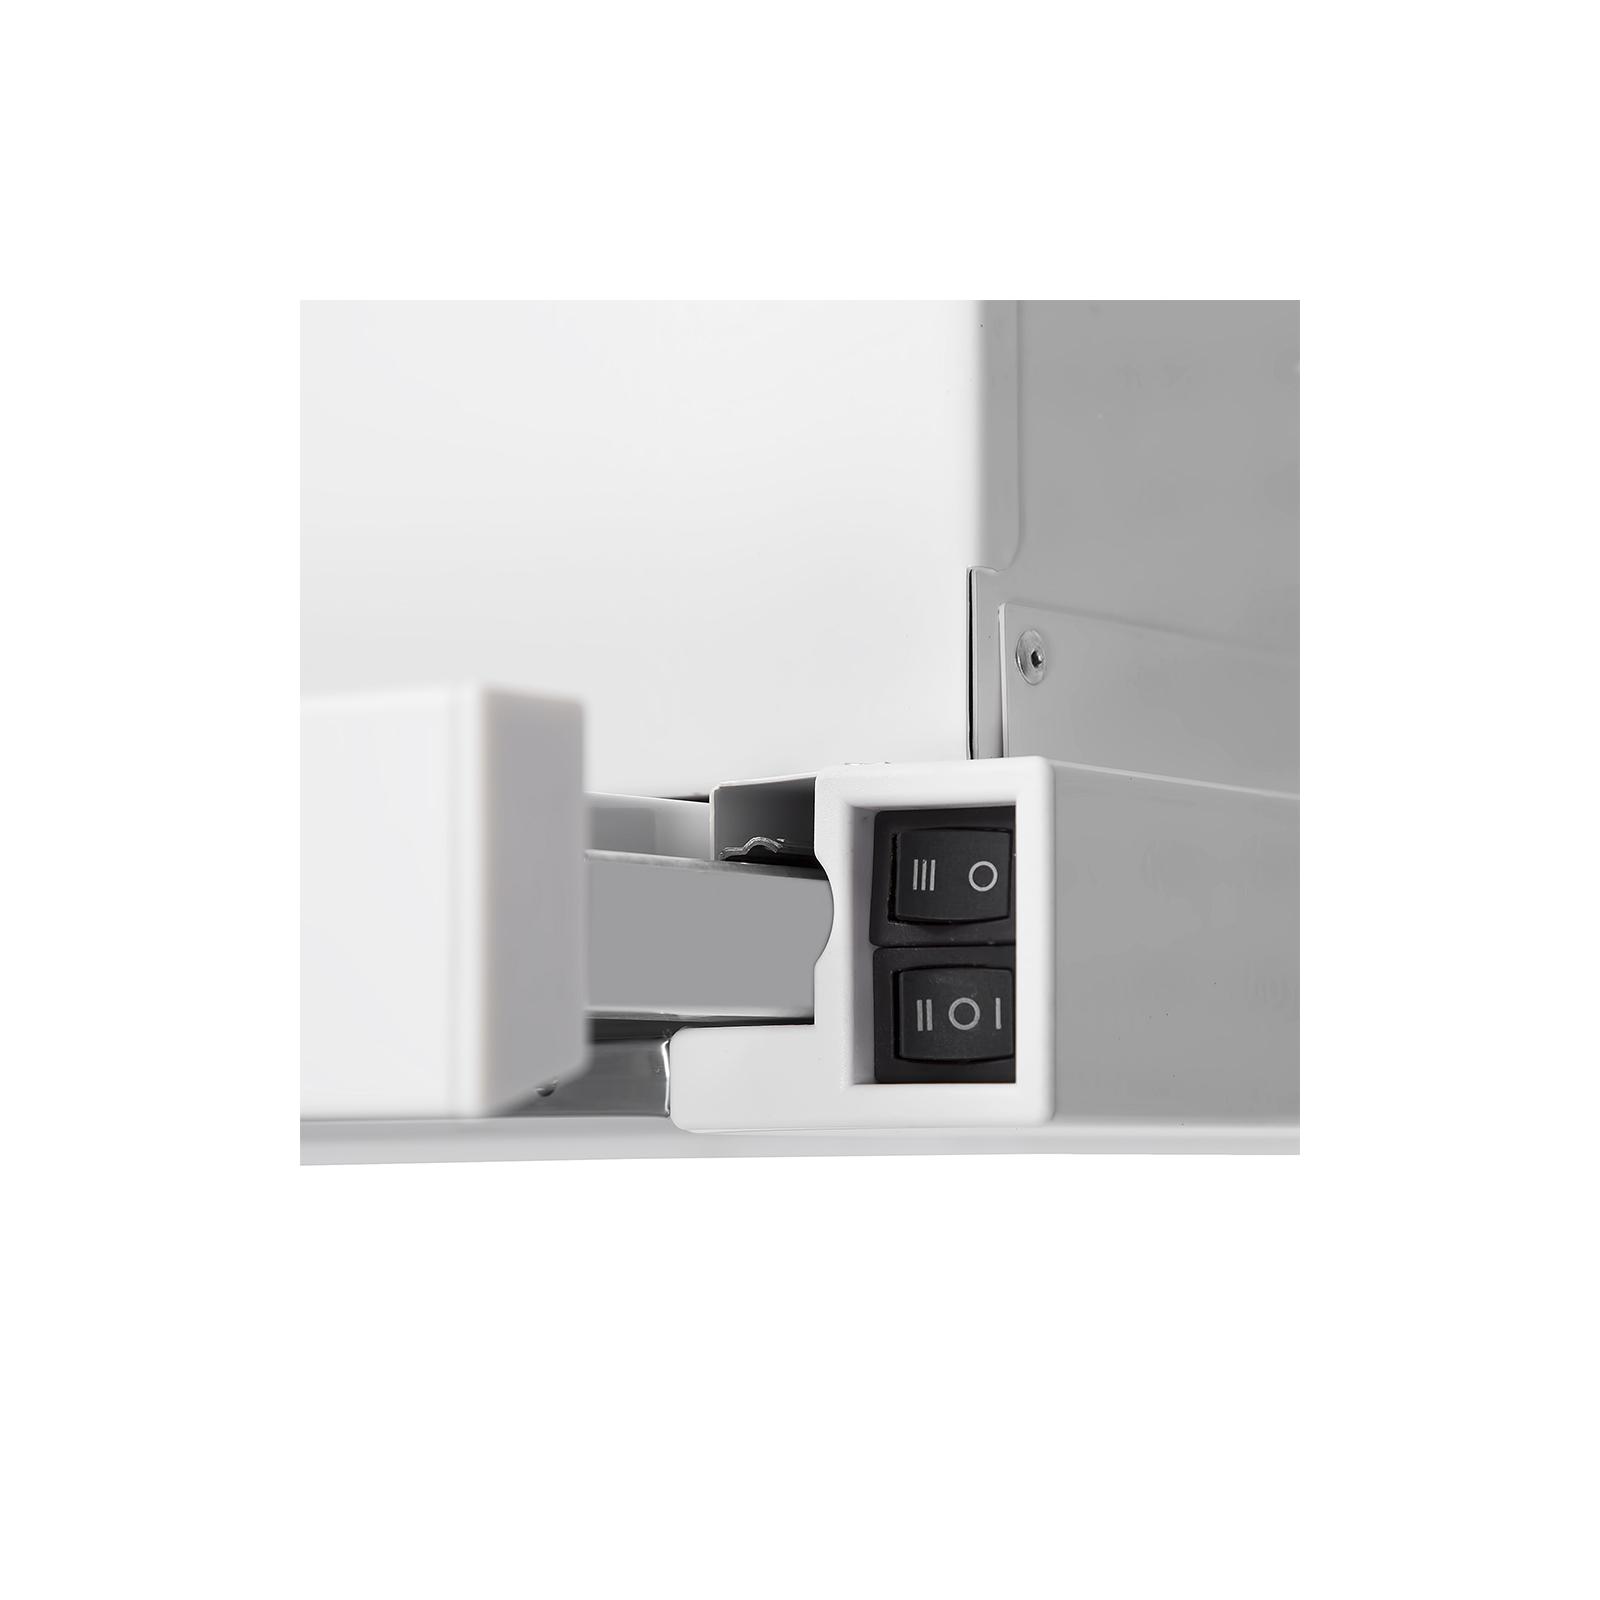 Вытяжка кухонная PERFELLI TL 6612 W LED изображение 3